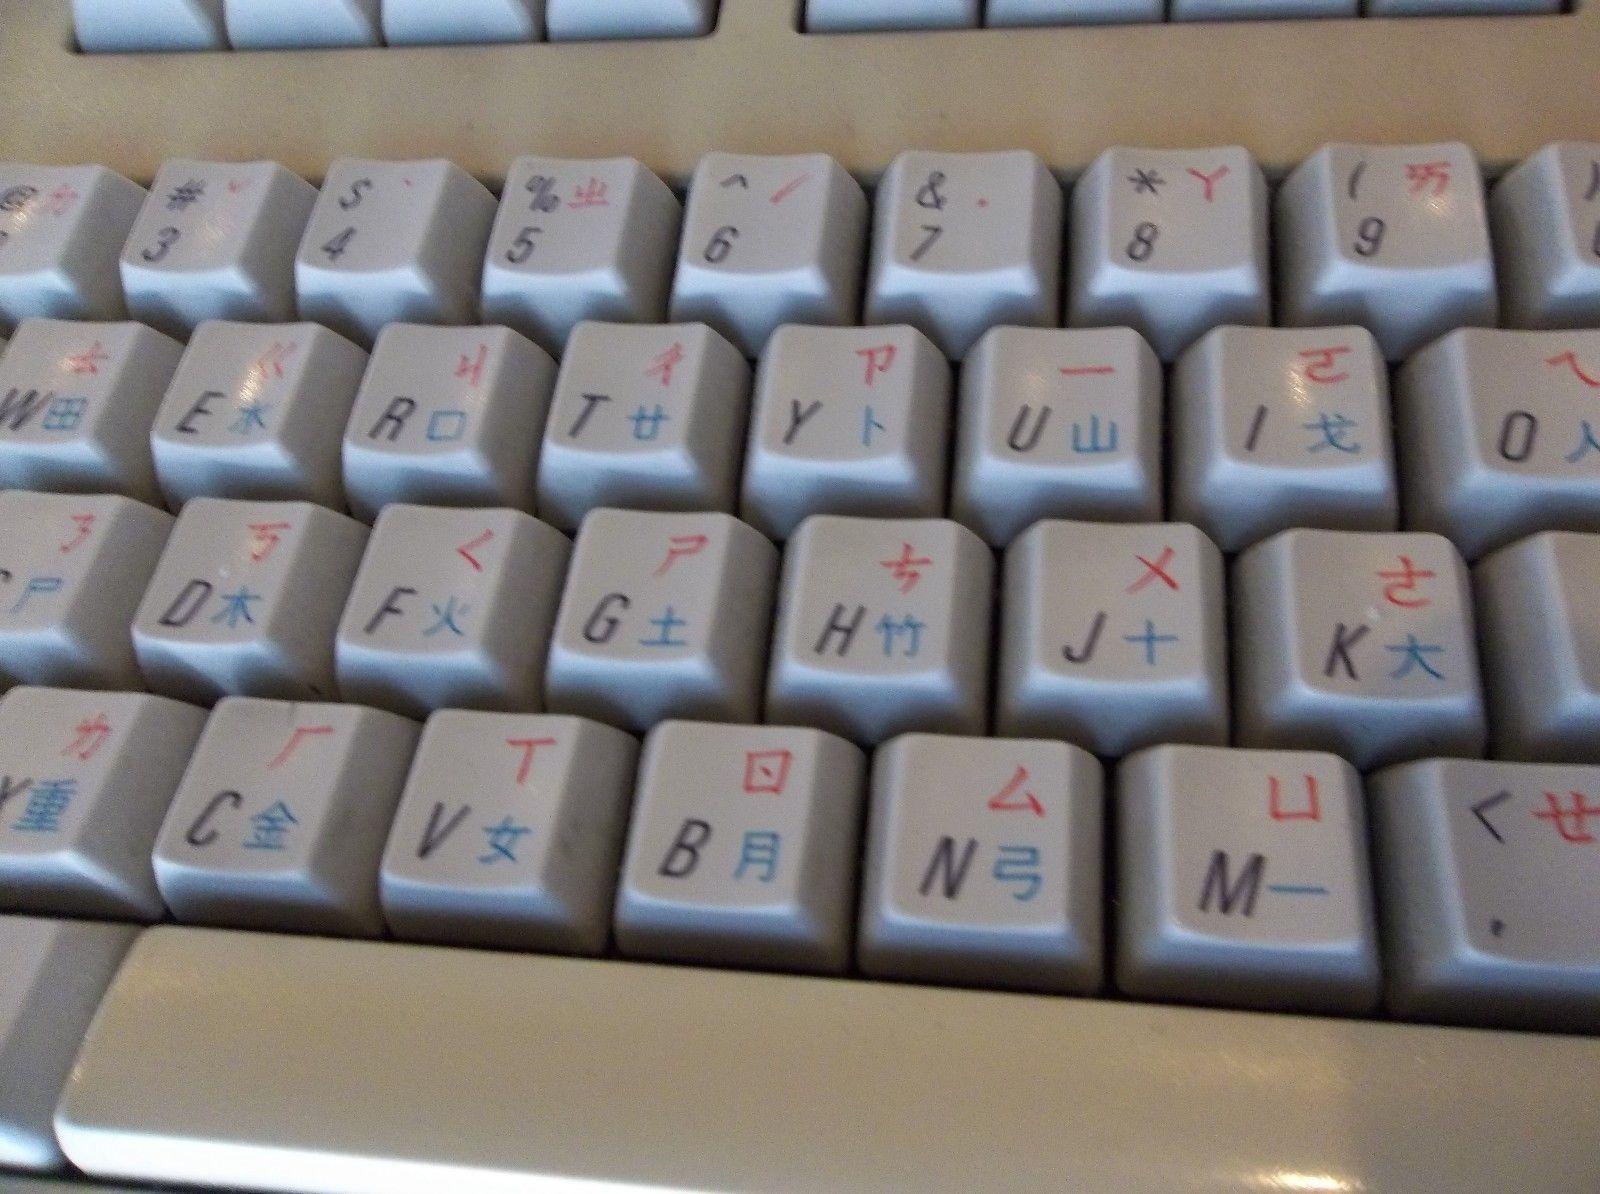 Russian Keyboard Symbol